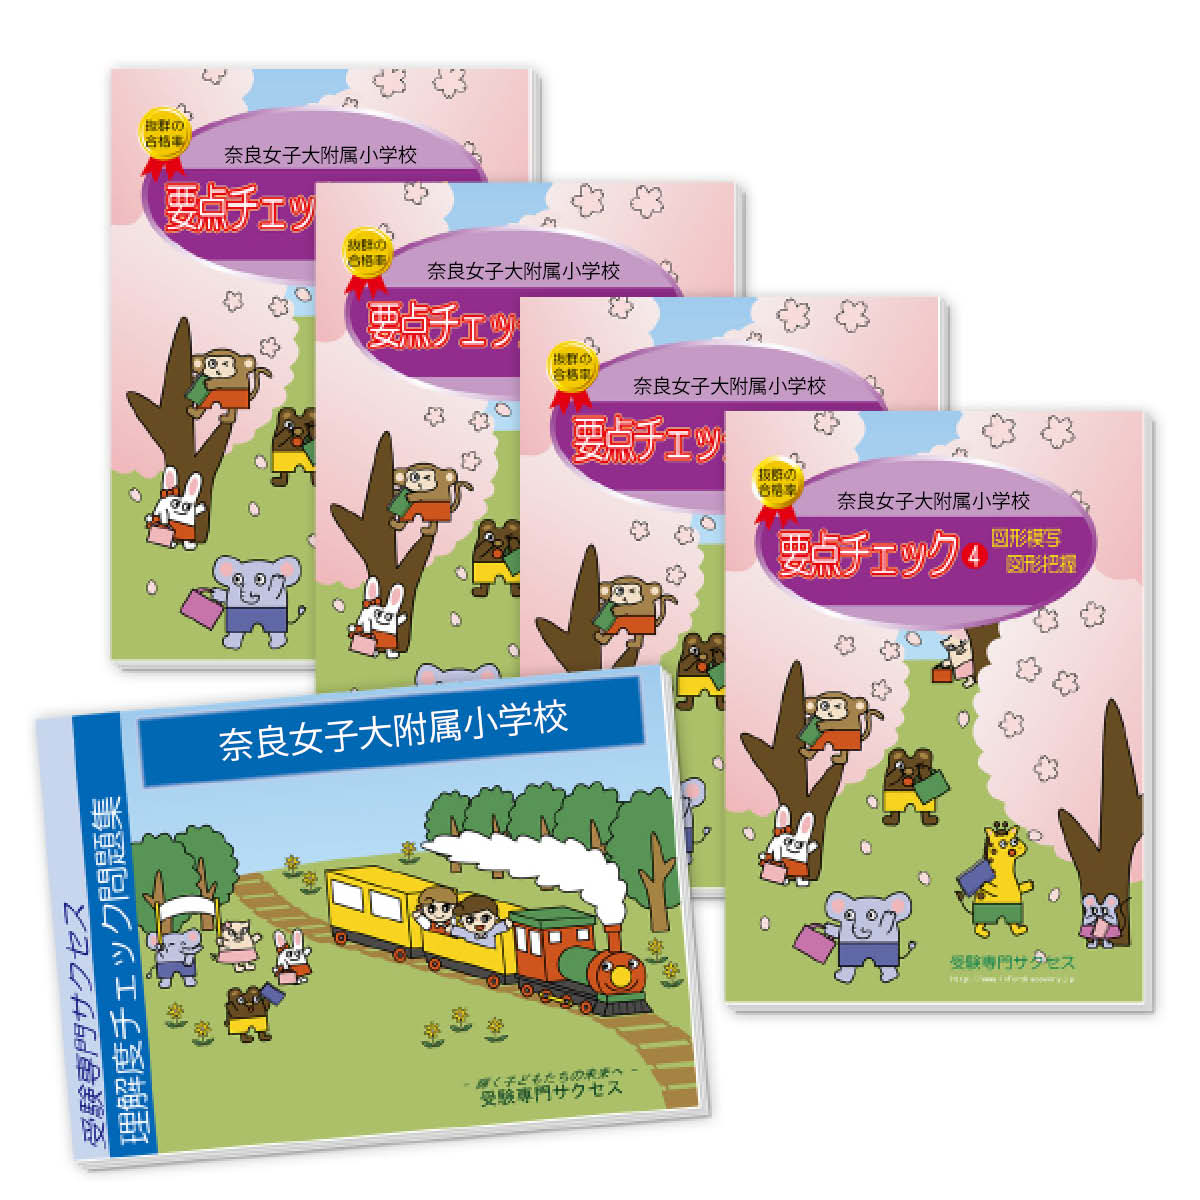 【送料・代引手数料無料】奈良女子大附属小学校・分野別要点チェック問題集